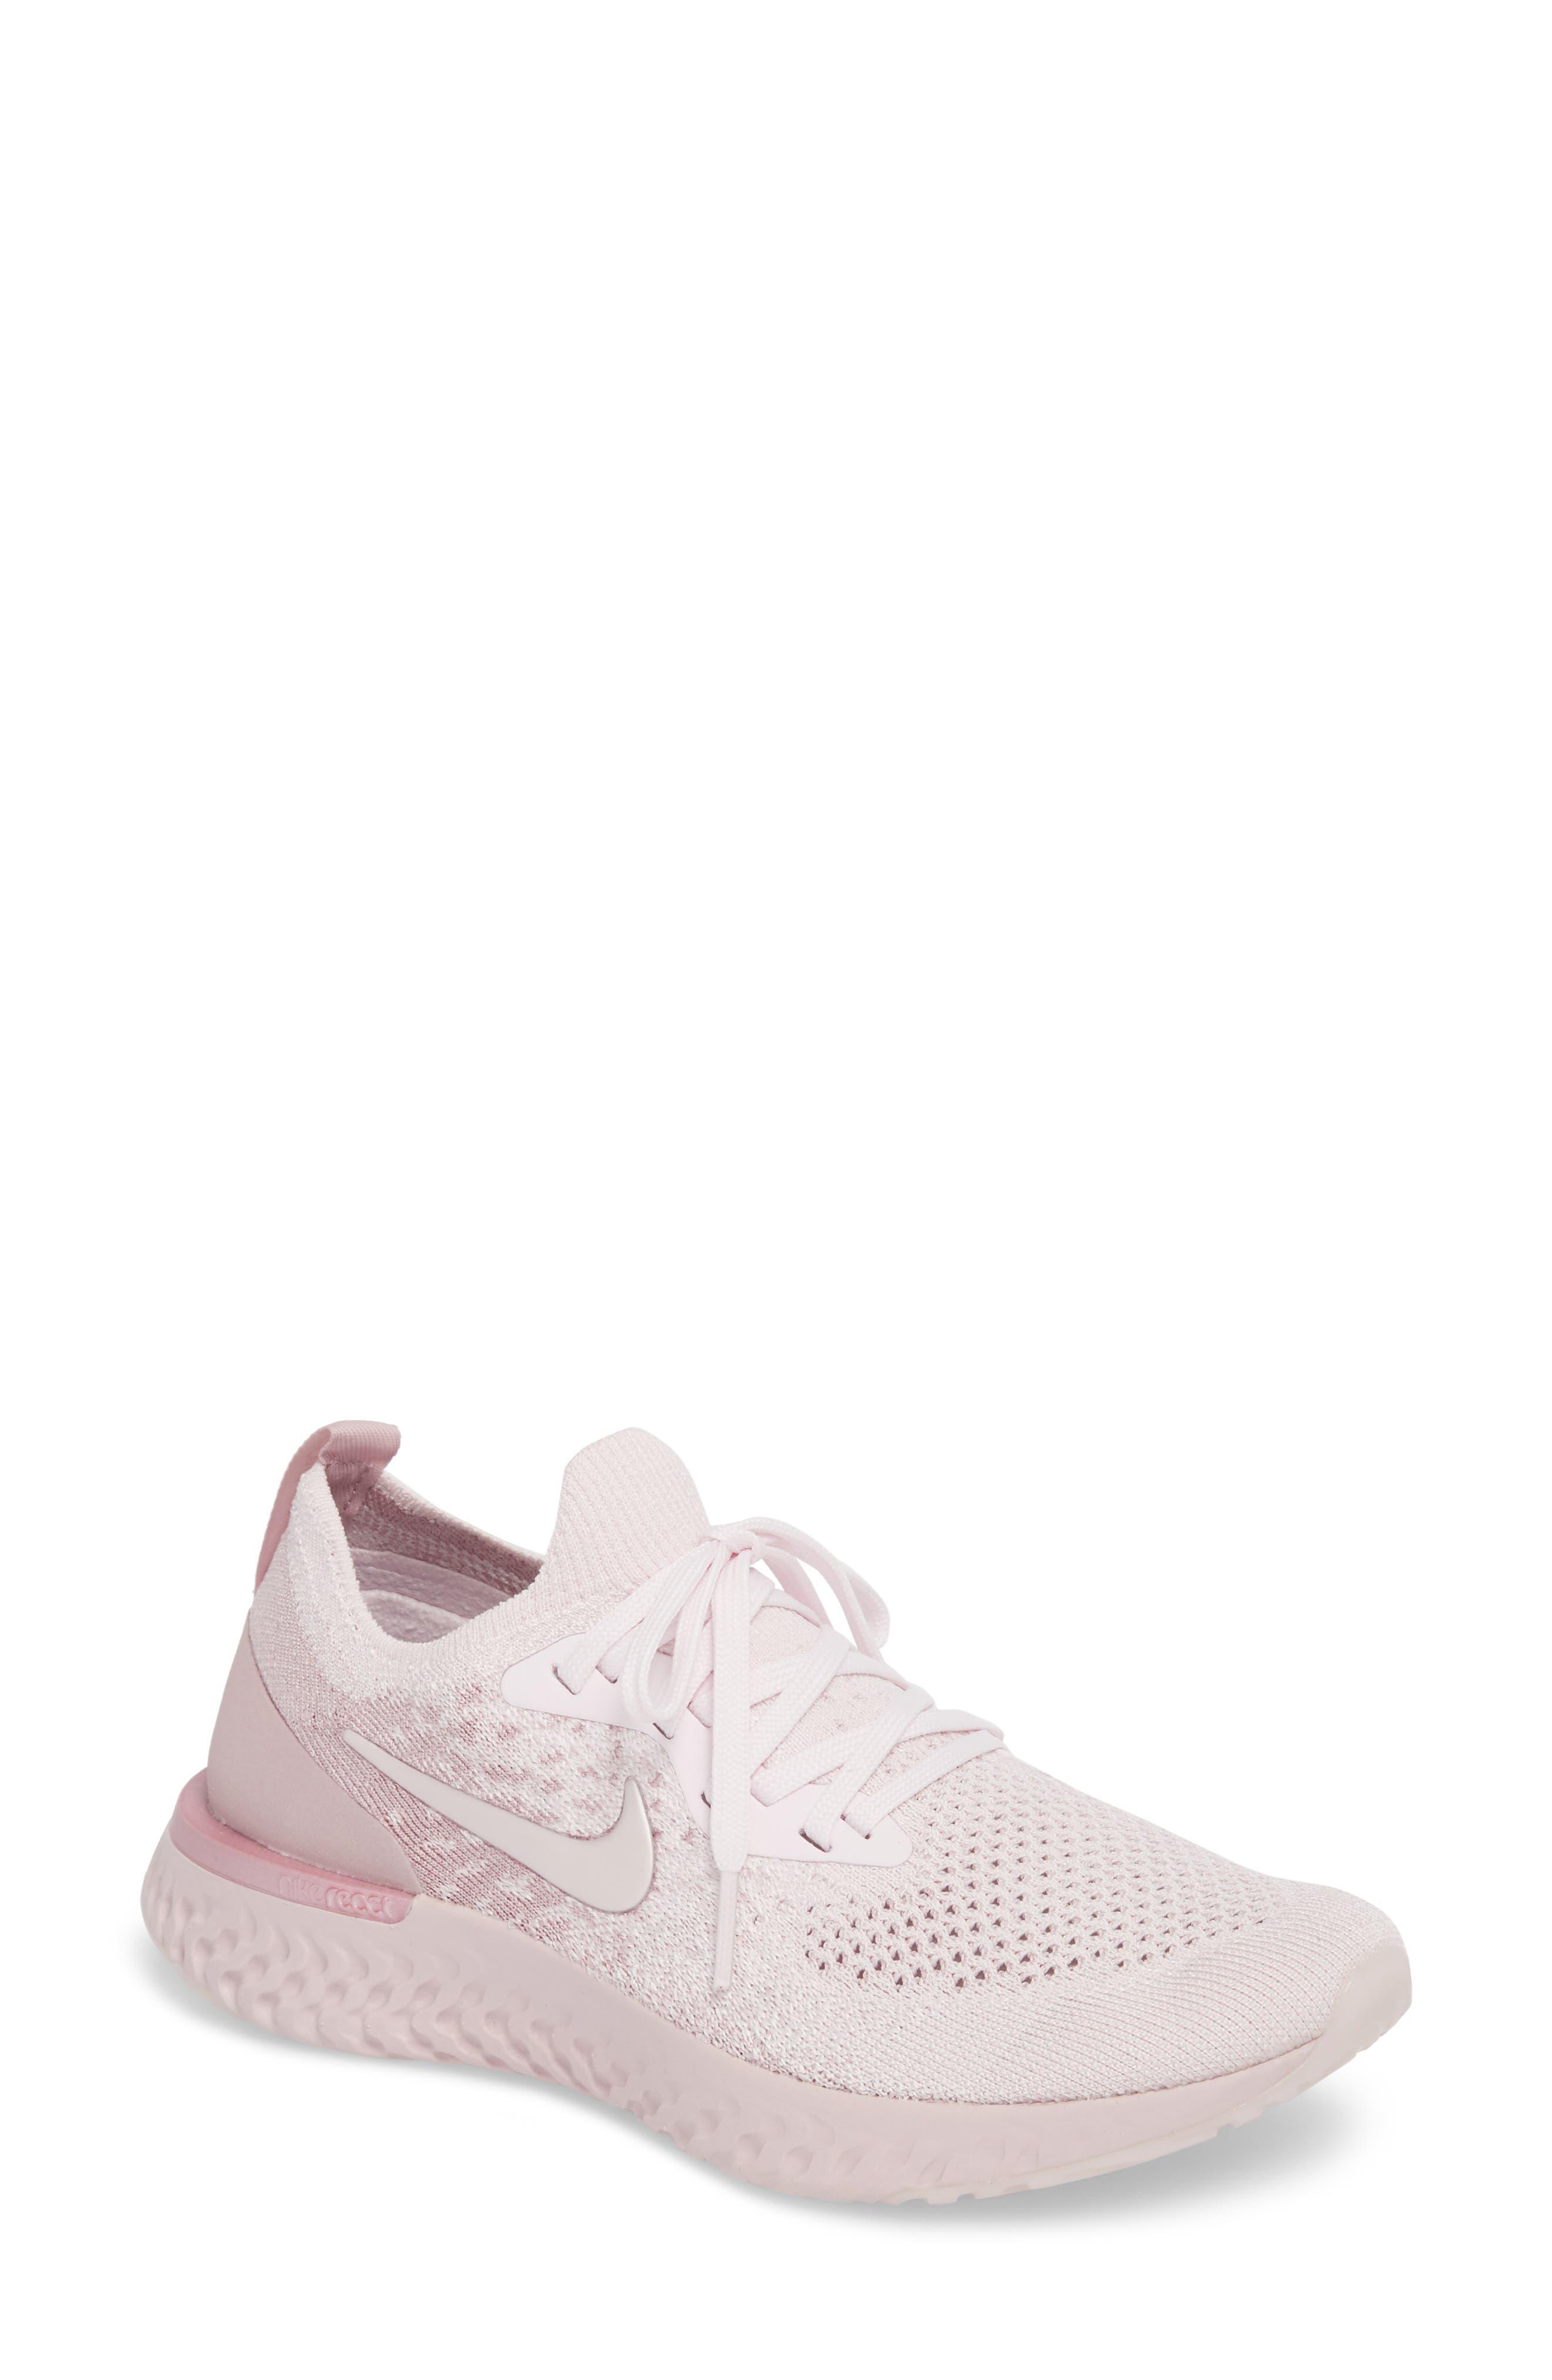 Nike Epic React Flyknit Running Shoe (Women). PEARL PINK/ ...